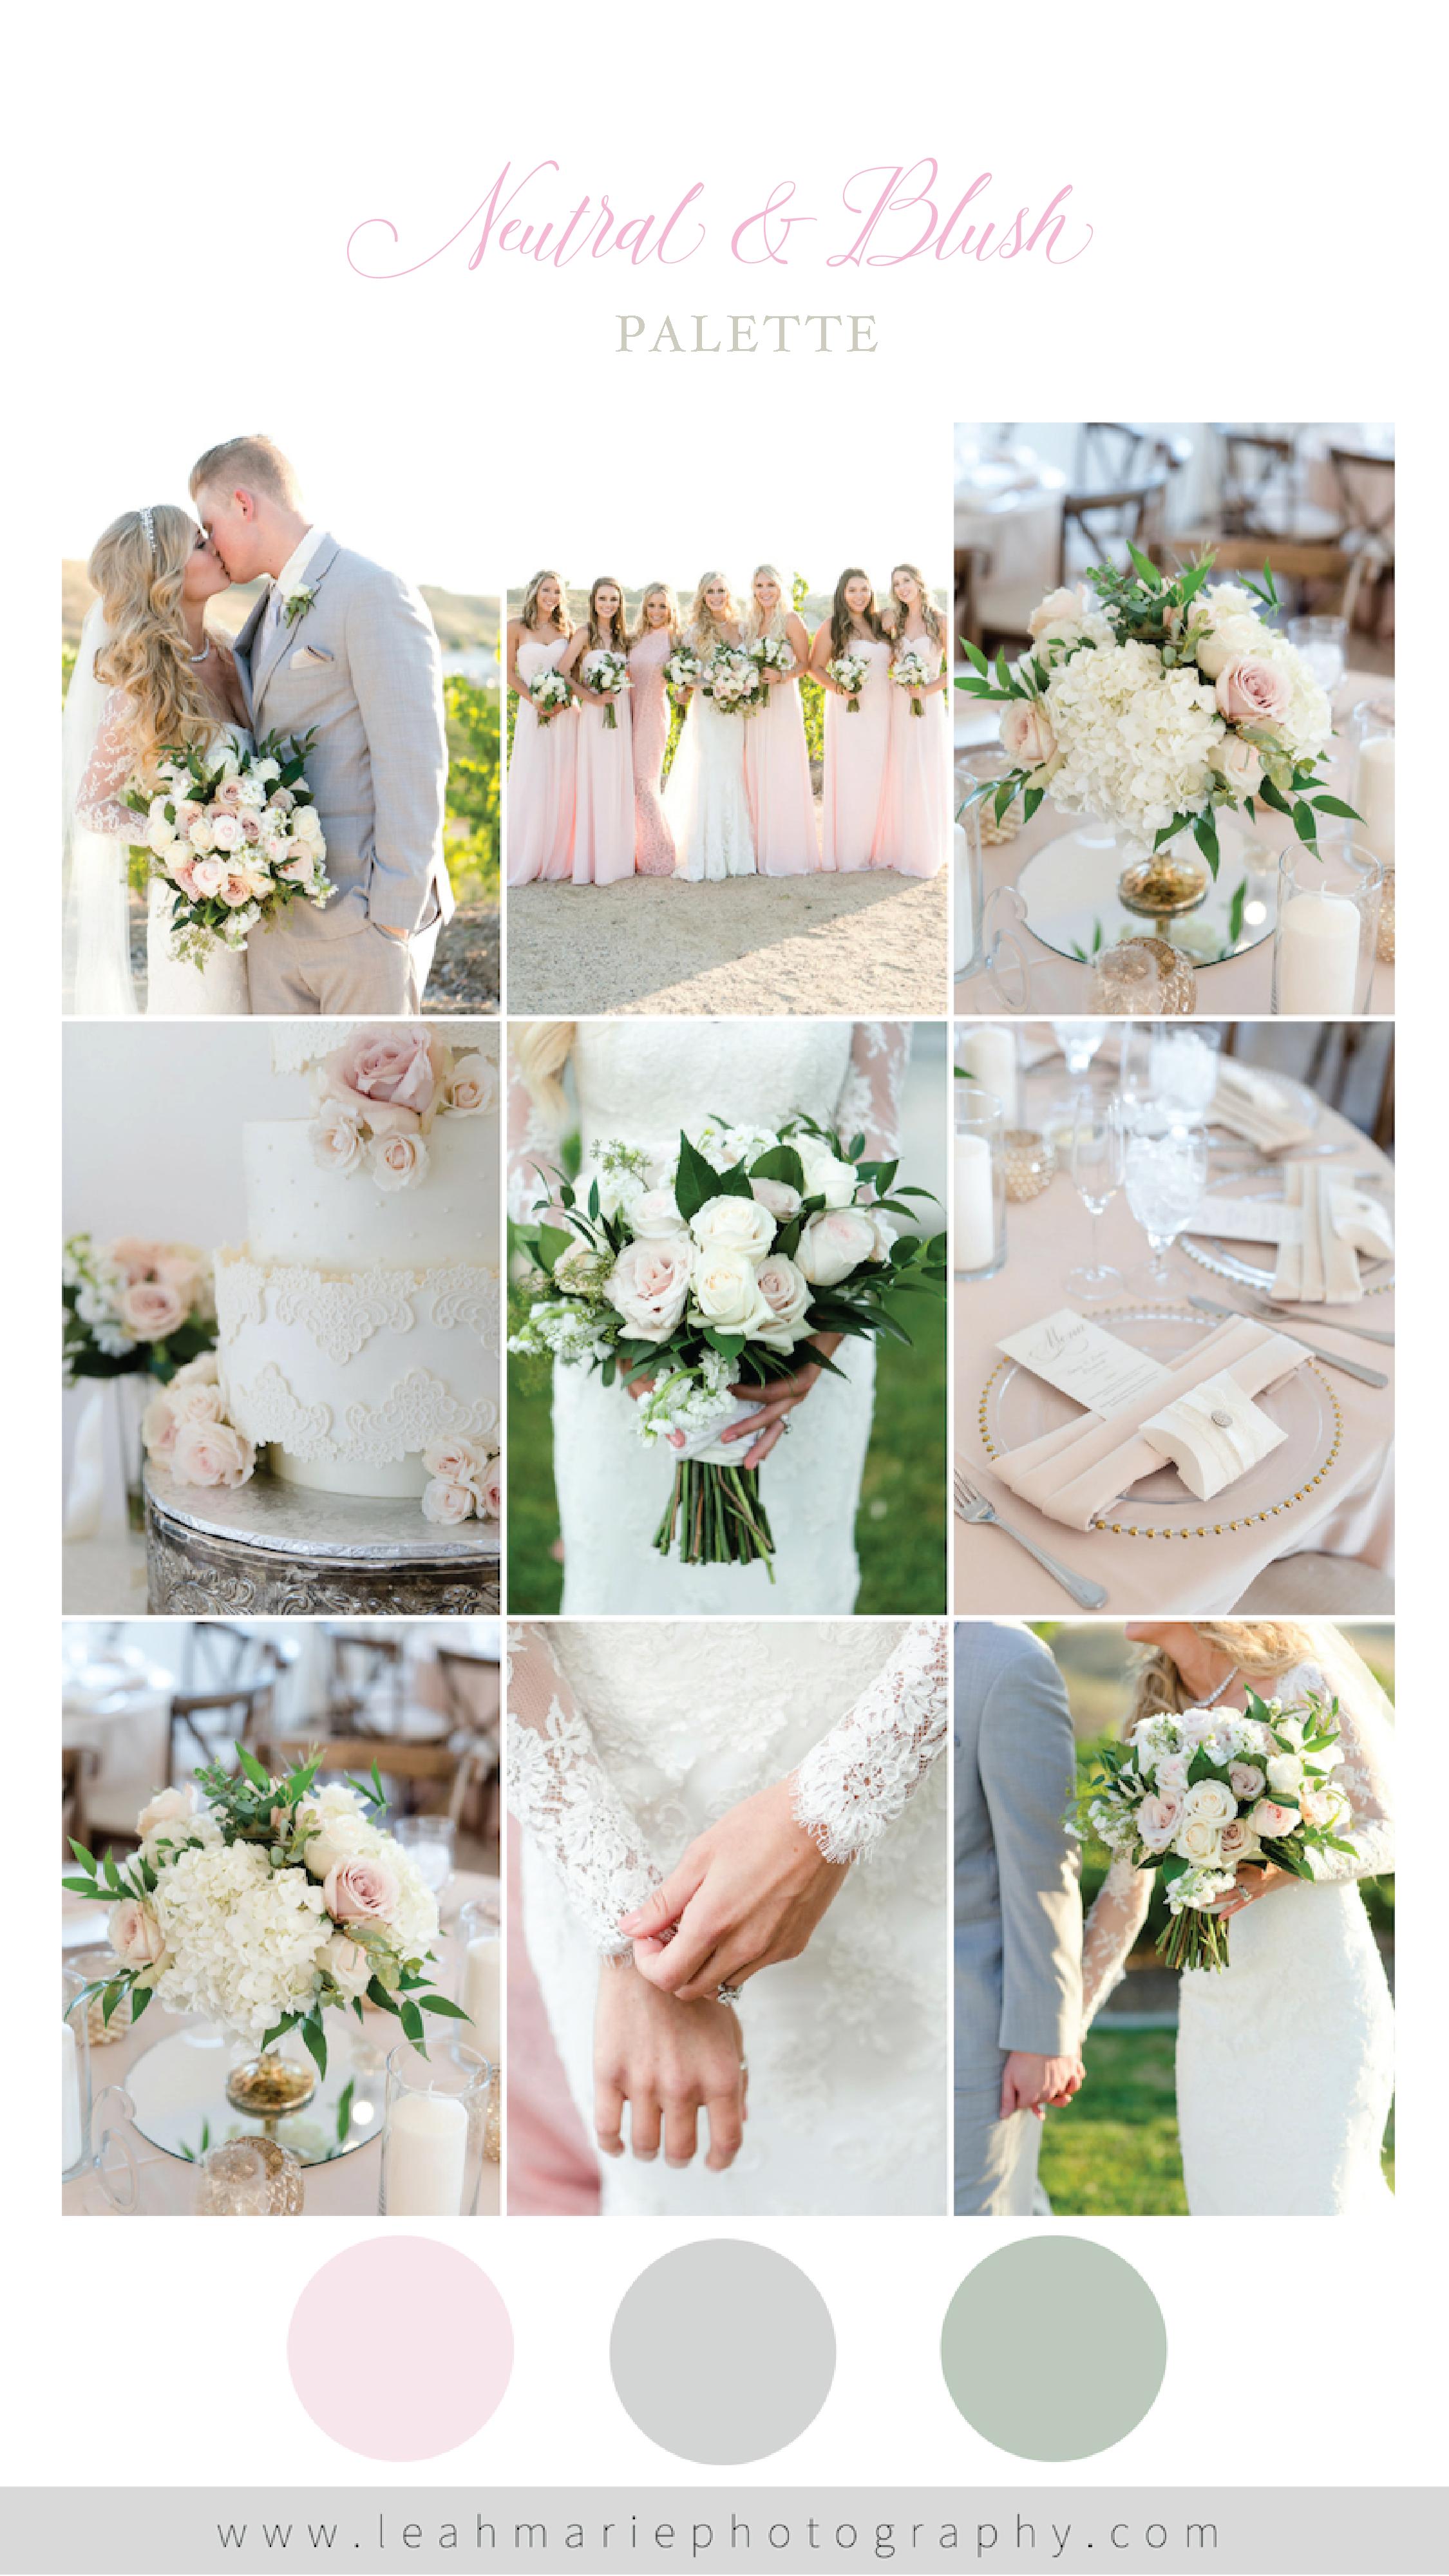 Temecula Wedding Photographer In 2020 Wedding Color Schemes Spring June Wedding Colors Blush Wedding Colors